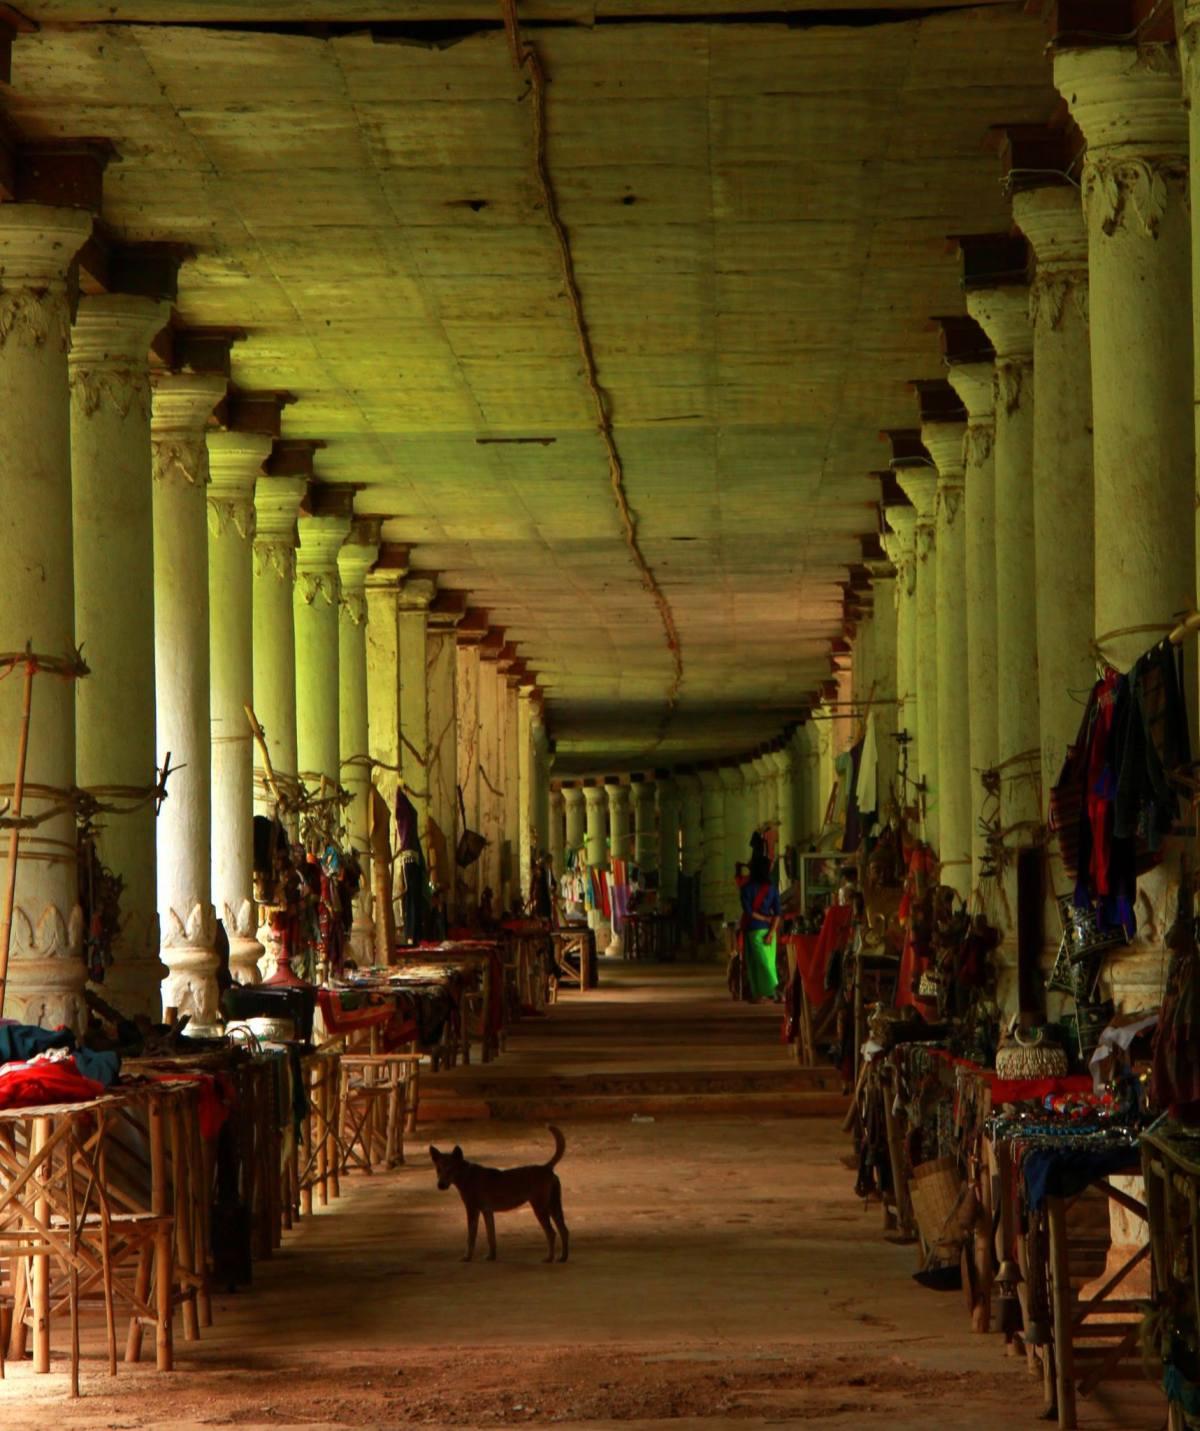 Indein shops have a good variety of handicrafts for sale